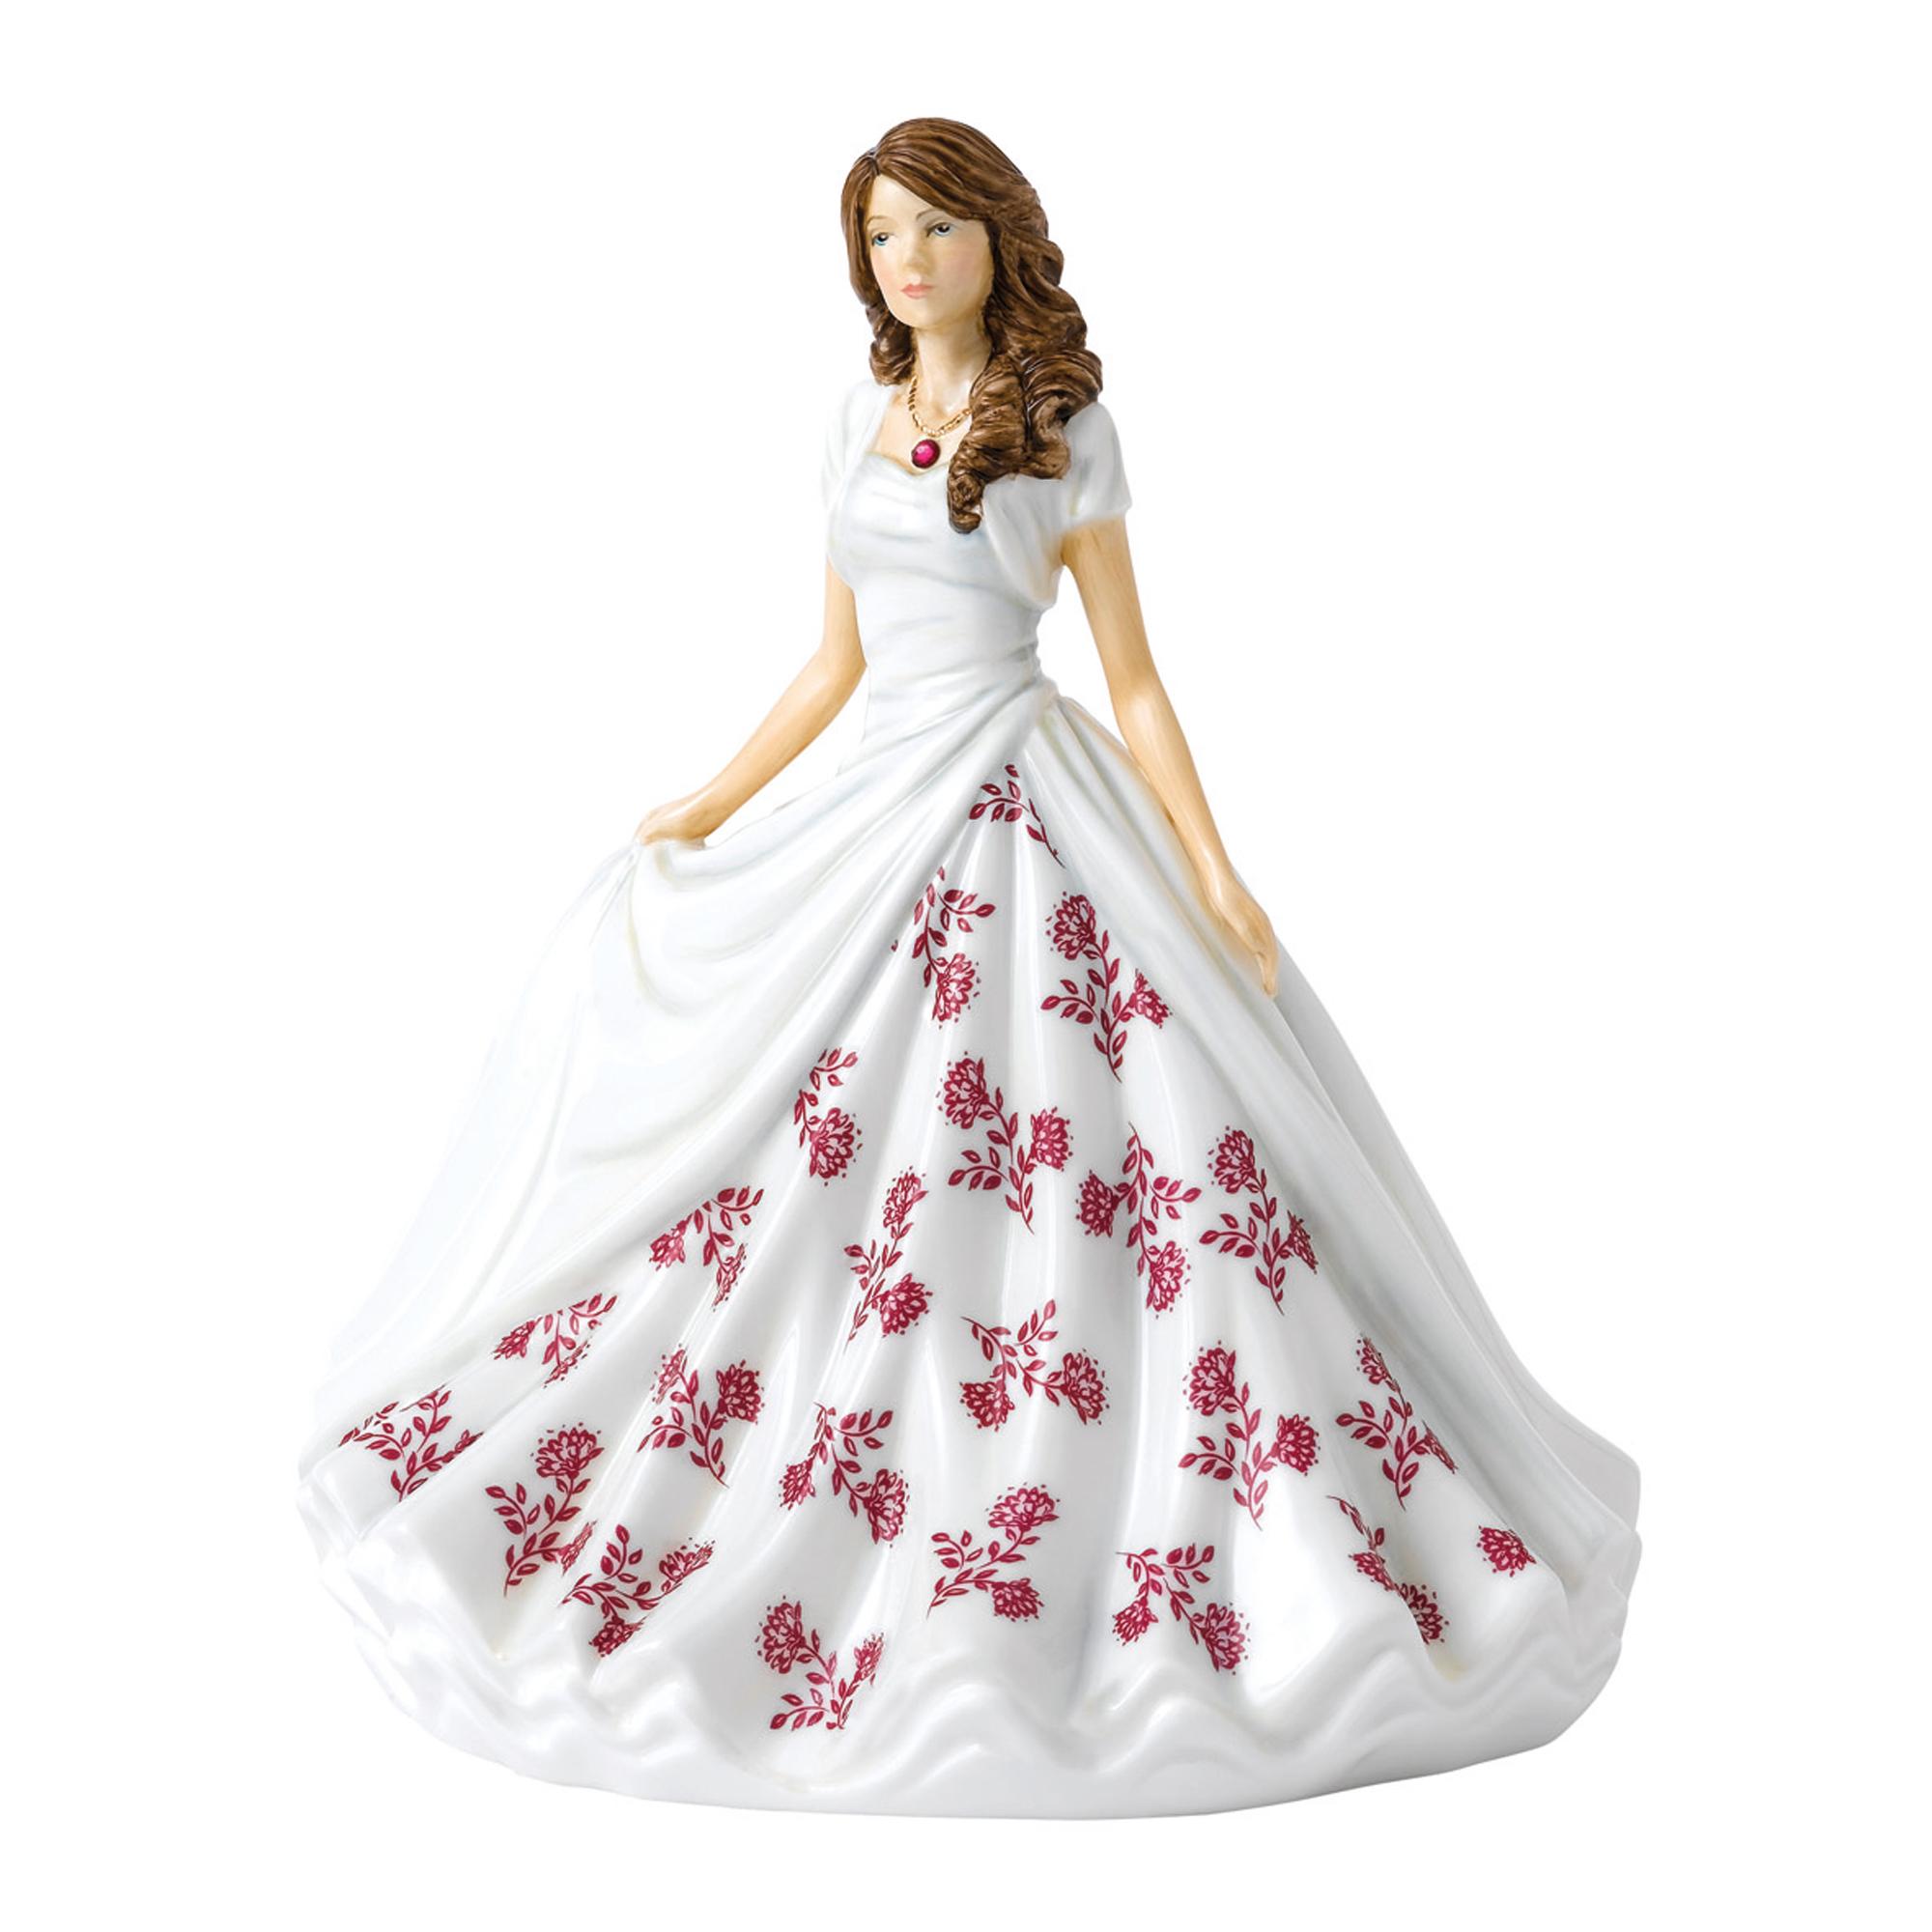 July (Ruby) HN5903 Royal Doulton Figurine